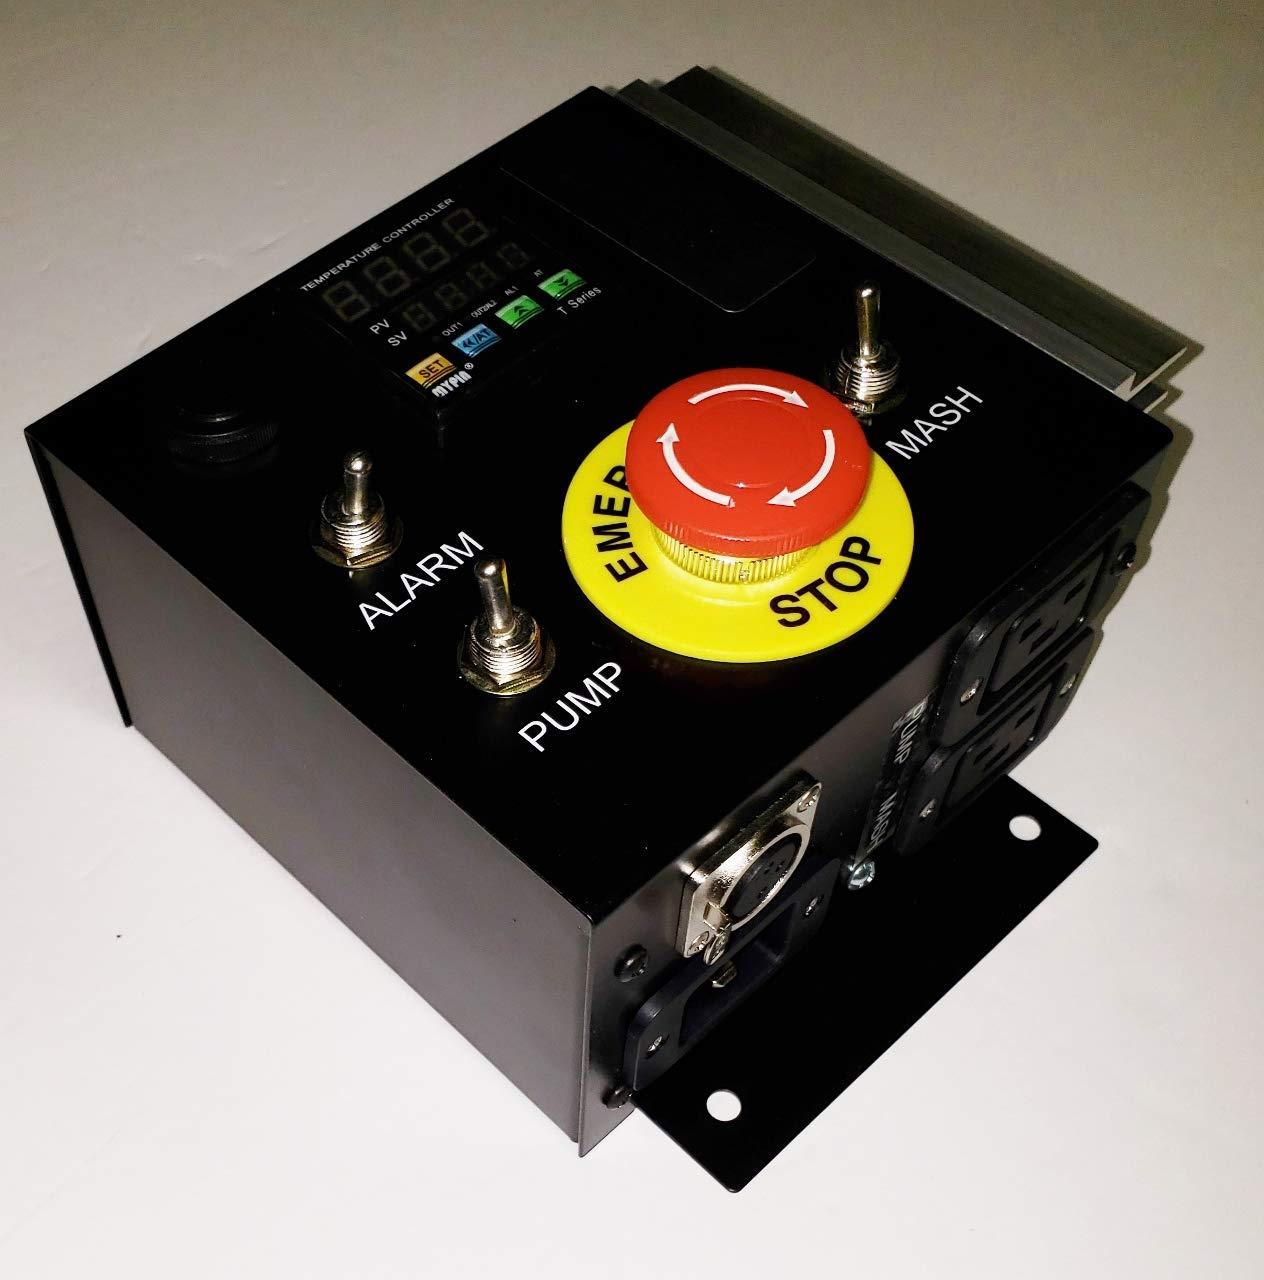 International 220/230/240v 50/60 Hz Mash Tun/RIMS (Recirculating Infusion Mash System) Tube Controller by Stir-Plate (Image #4)